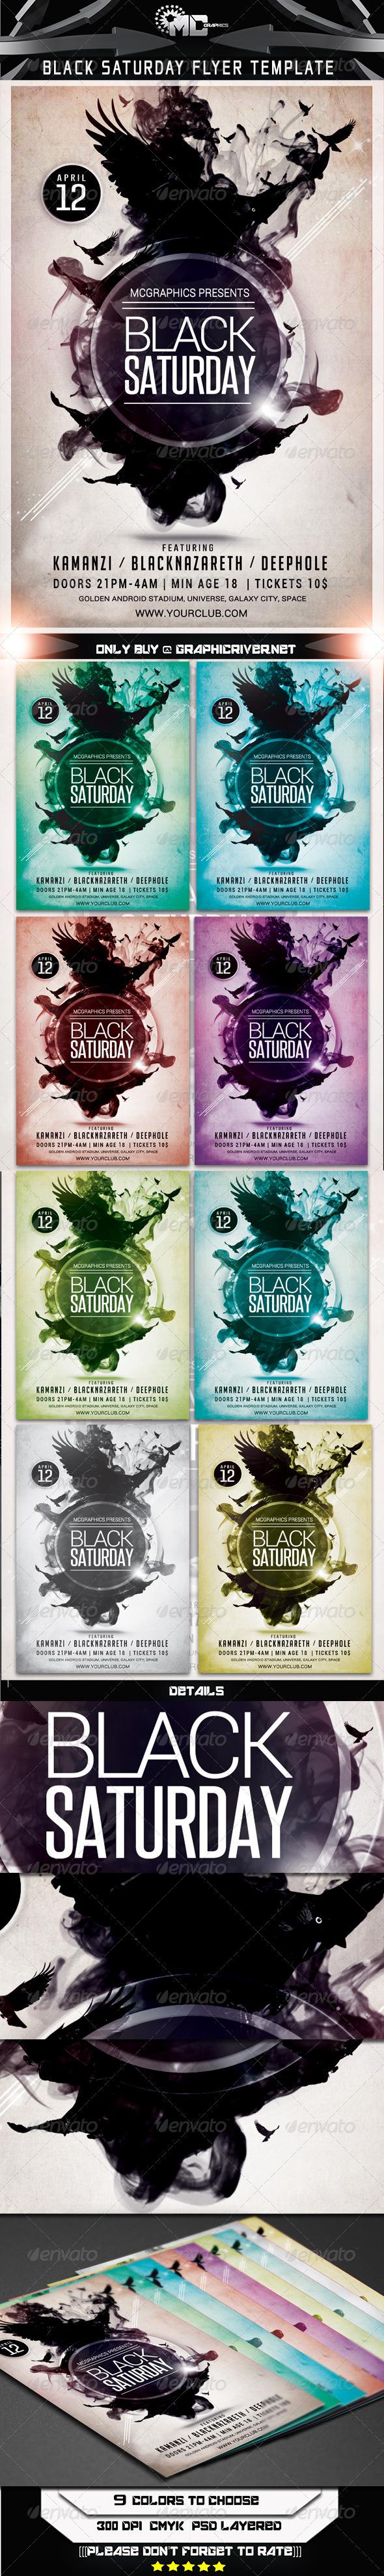 Black Saturday Flyer Template - Flyers Print Templates